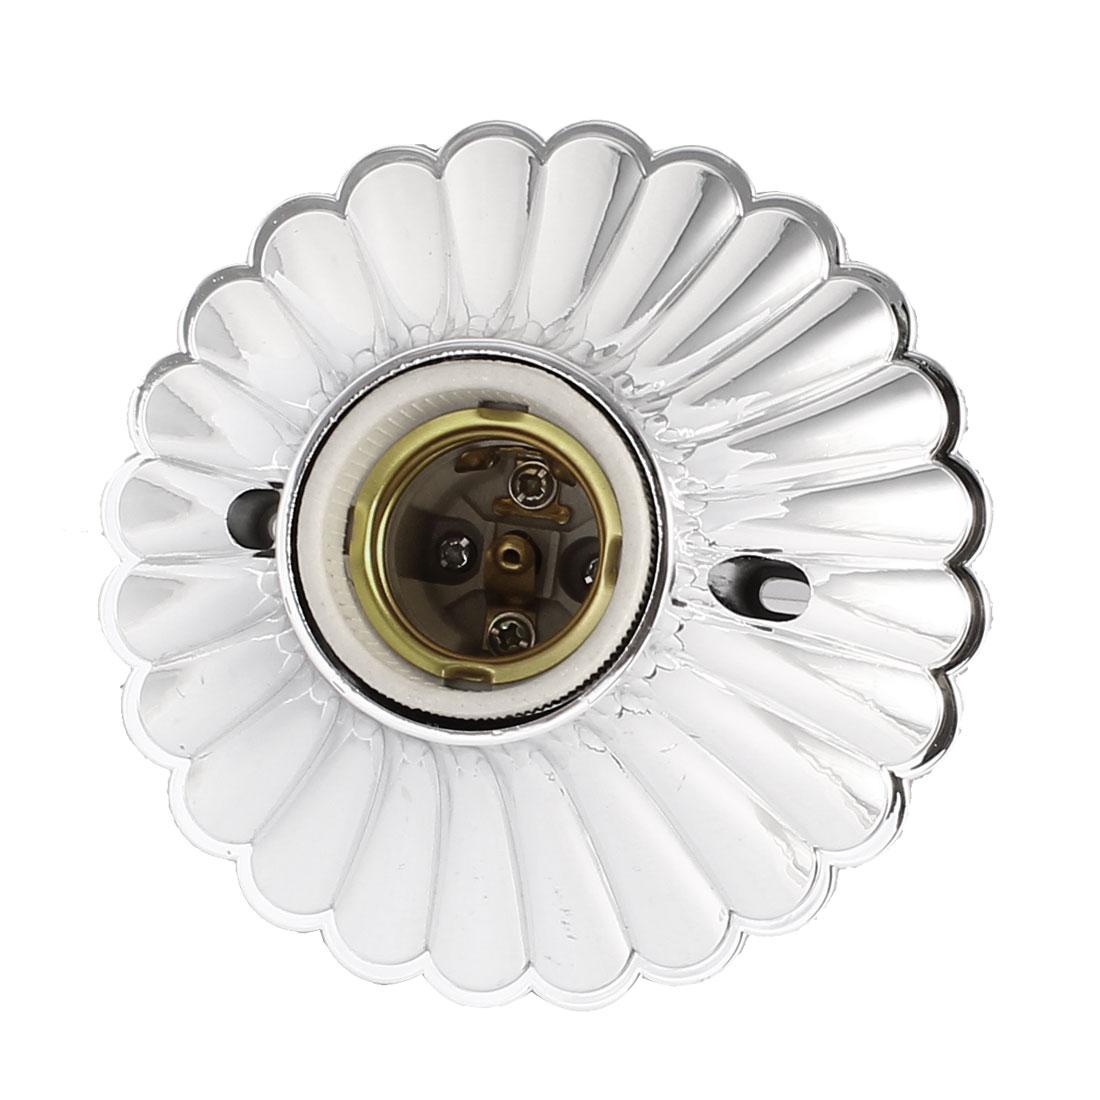 AC 250V 4A 11cm Dia Silver Tone Plastic Housing E27 Screw Base Lamp Light Holder